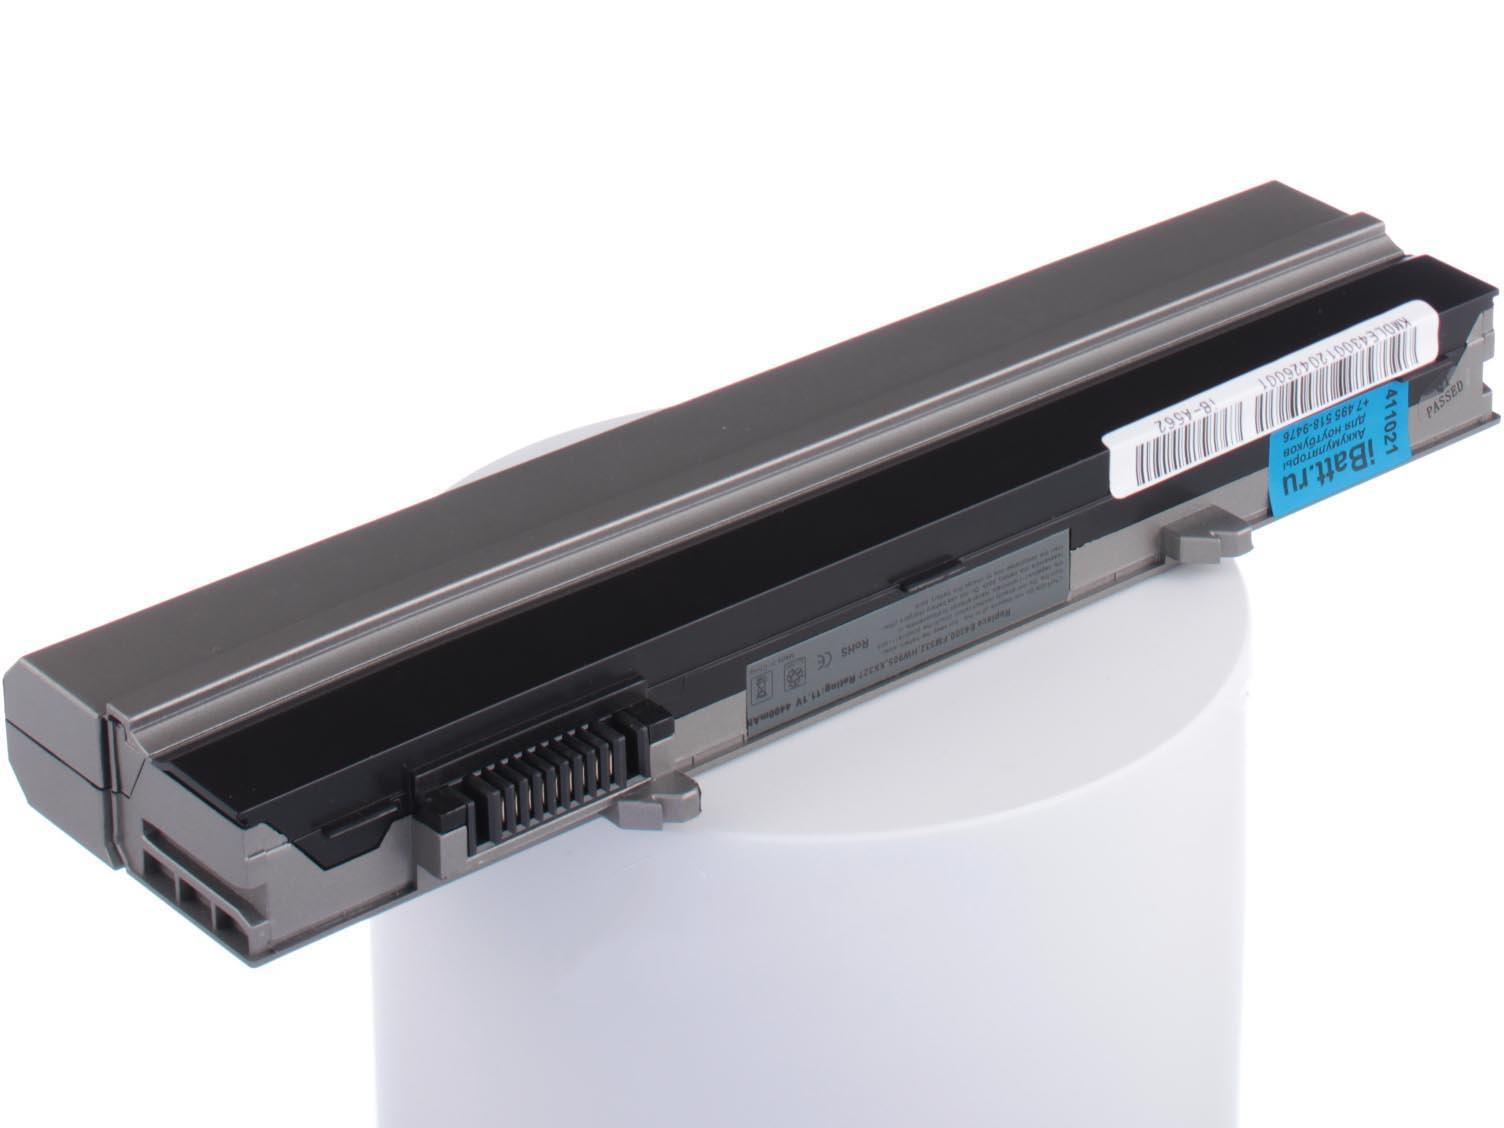 Фото - Аккумулятор для ноутбука iBatt Dell R3026, CP284, CP308, FM338, HW892, CP294, FM332, XX327, 3X021 аккумулятор